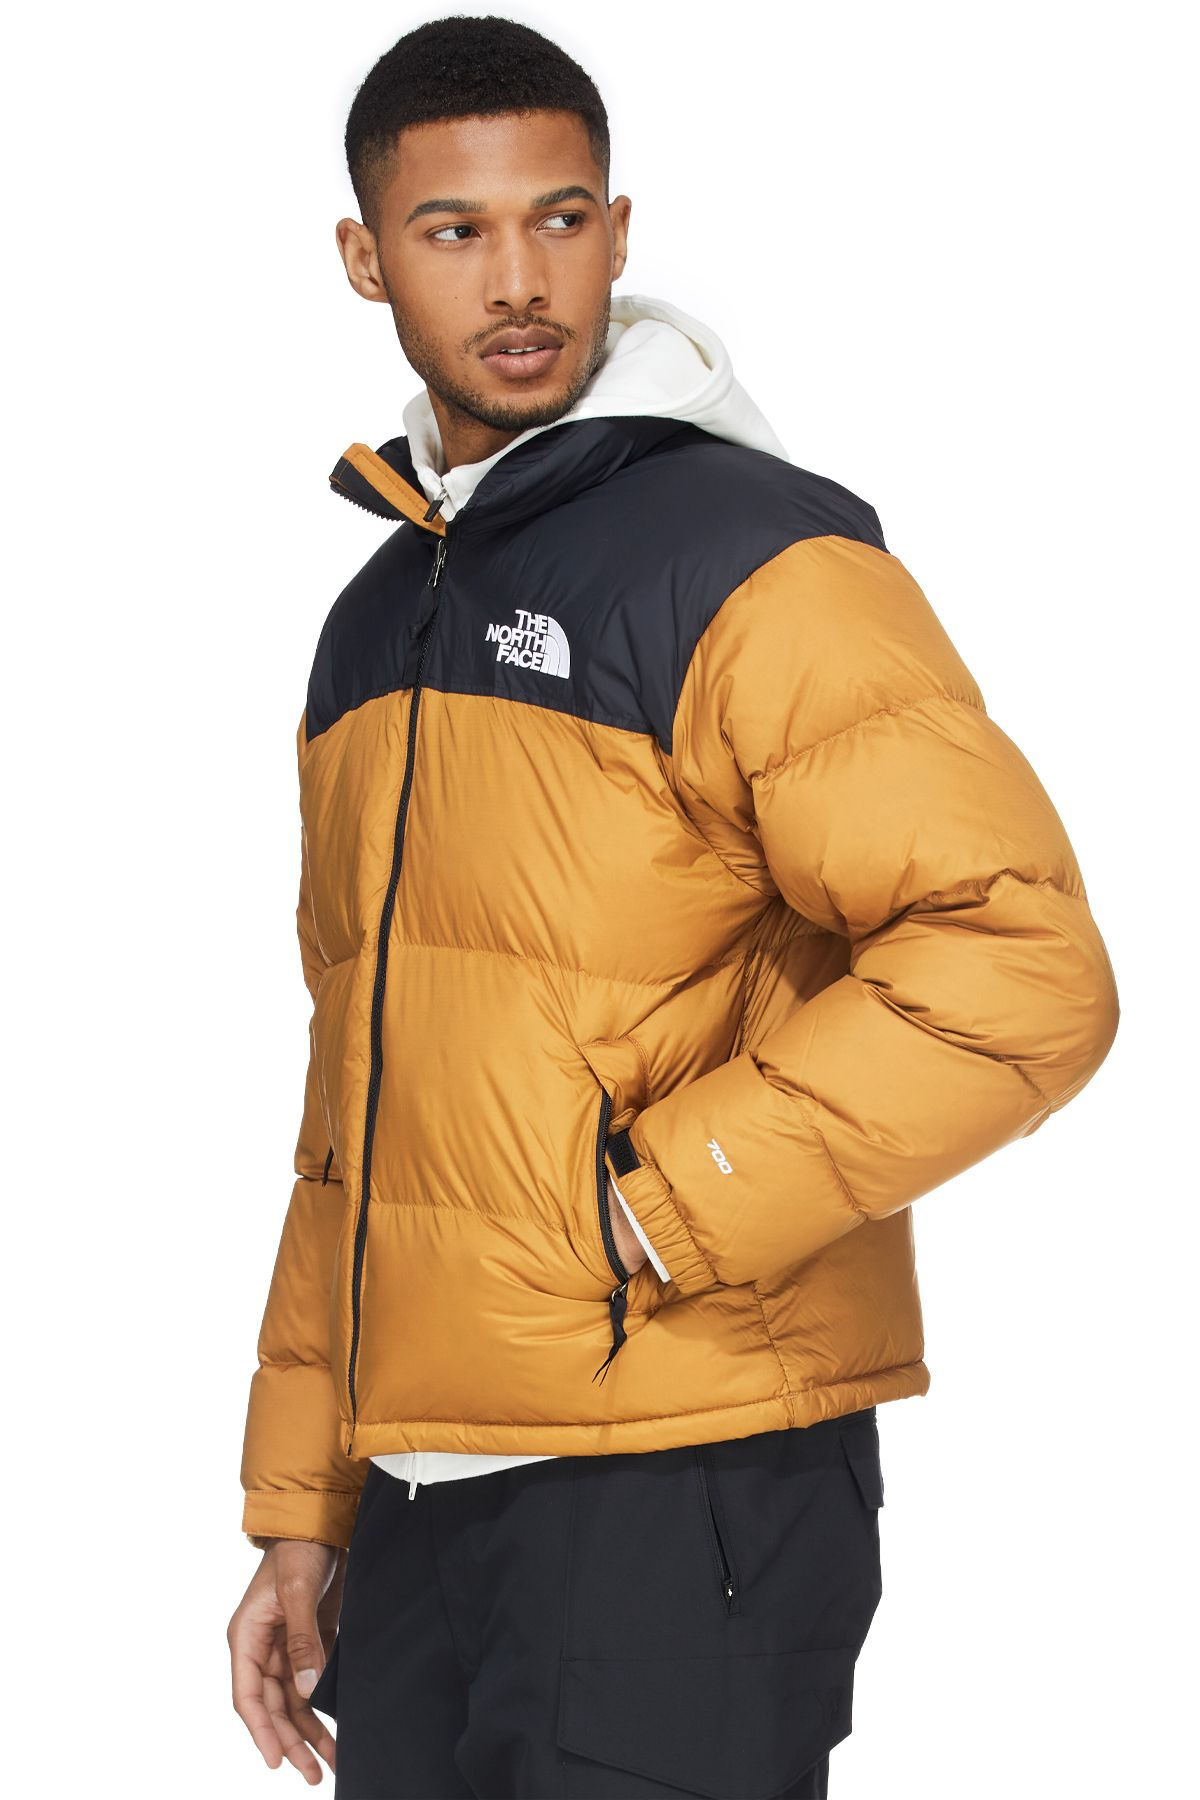 The North Face 1996 Retro Nuptse Jacket Timber Tan 1996 Retro Nuptse Jacket Retro Nuptse Jacket The North Face 1996 [ 1800 x 1200 Pixel ]